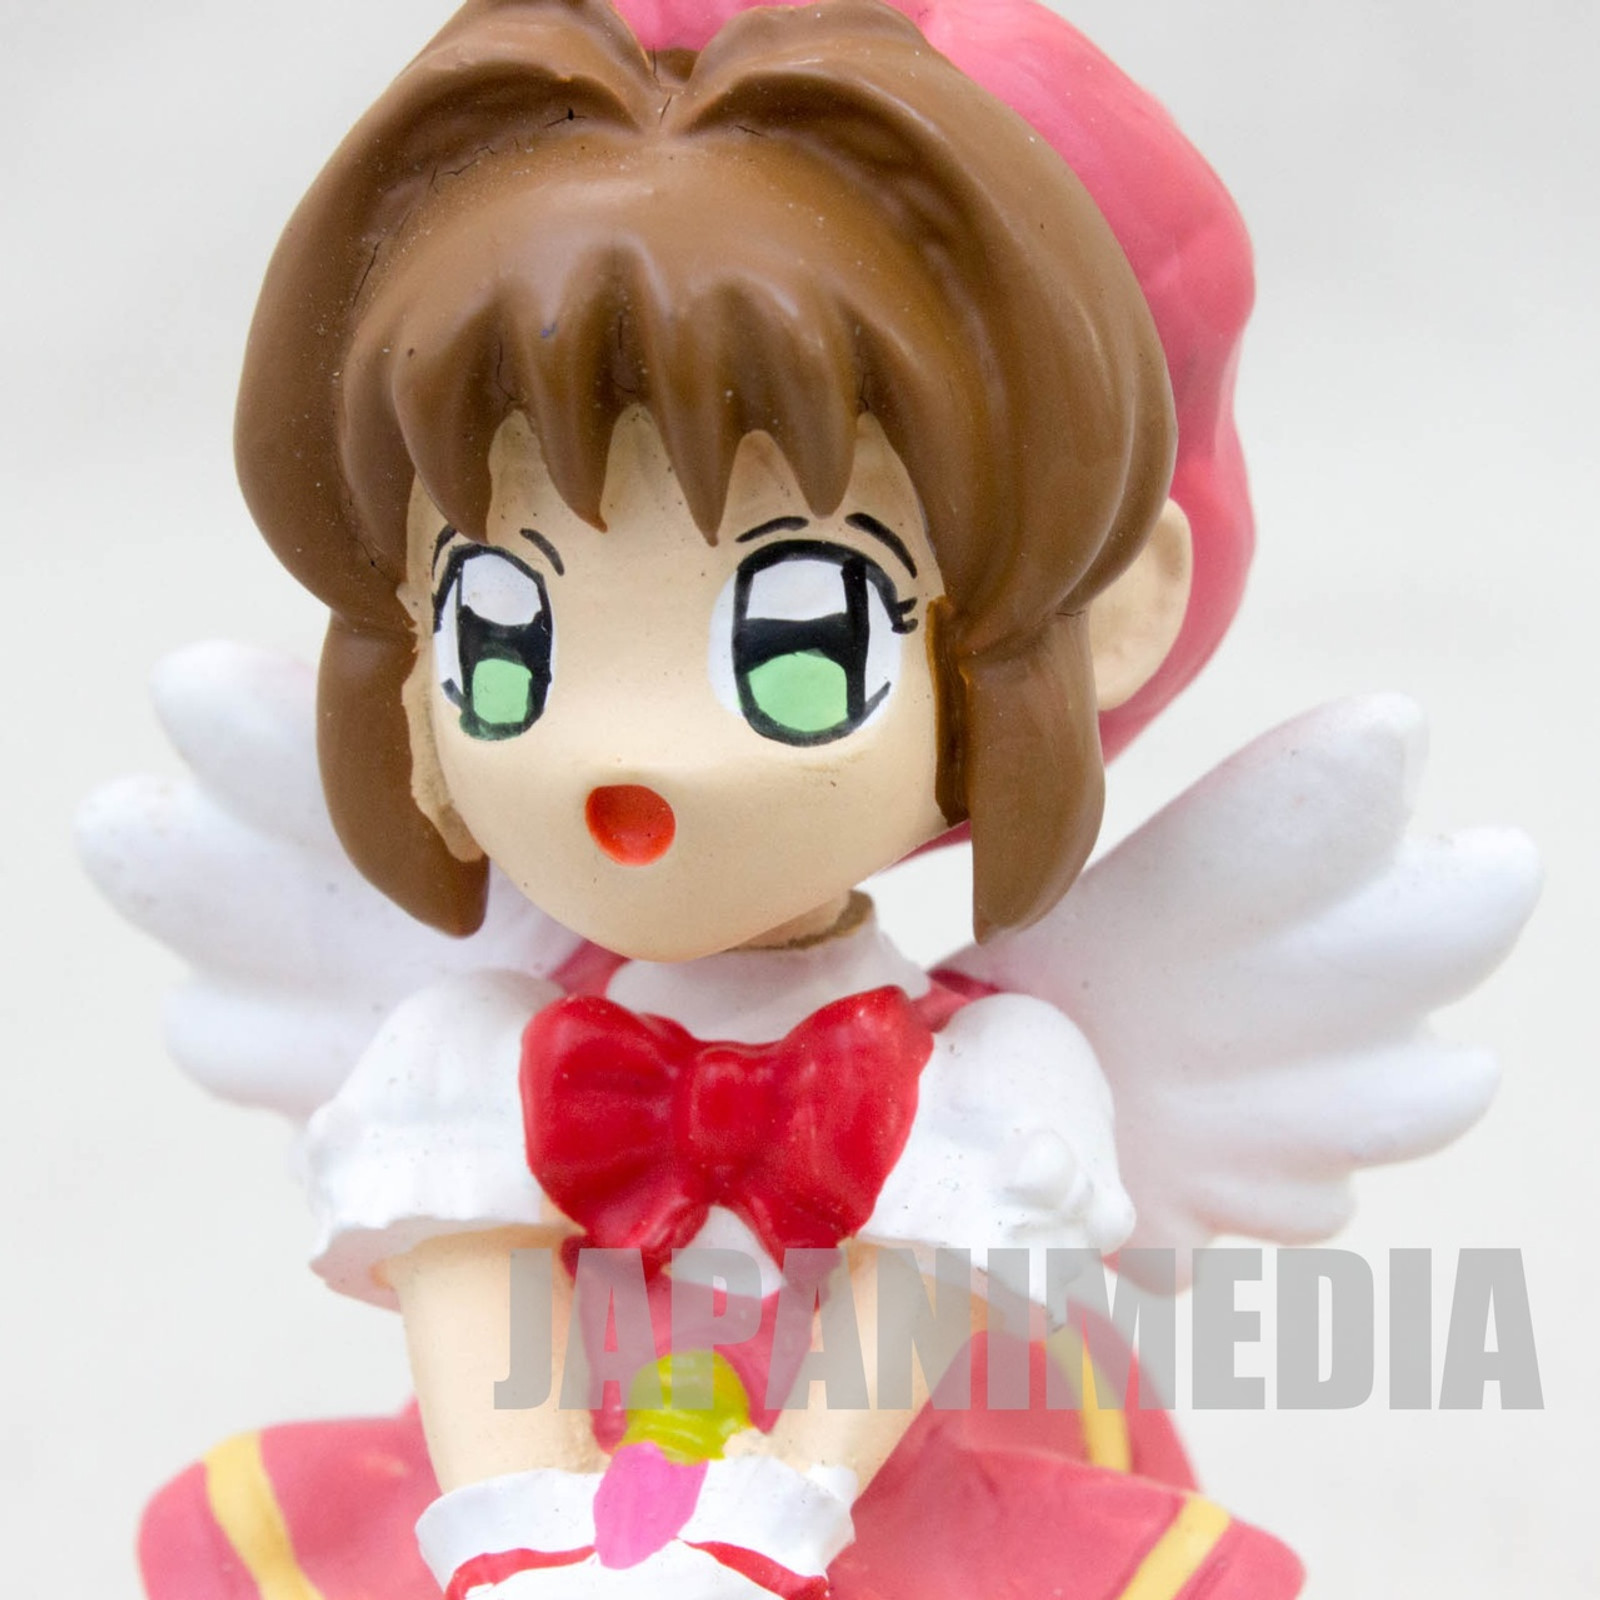 Cardcaptor Sakura Polystone Figure Battle Uniform Ver. CLAMP JAPAN ANIME MANGA